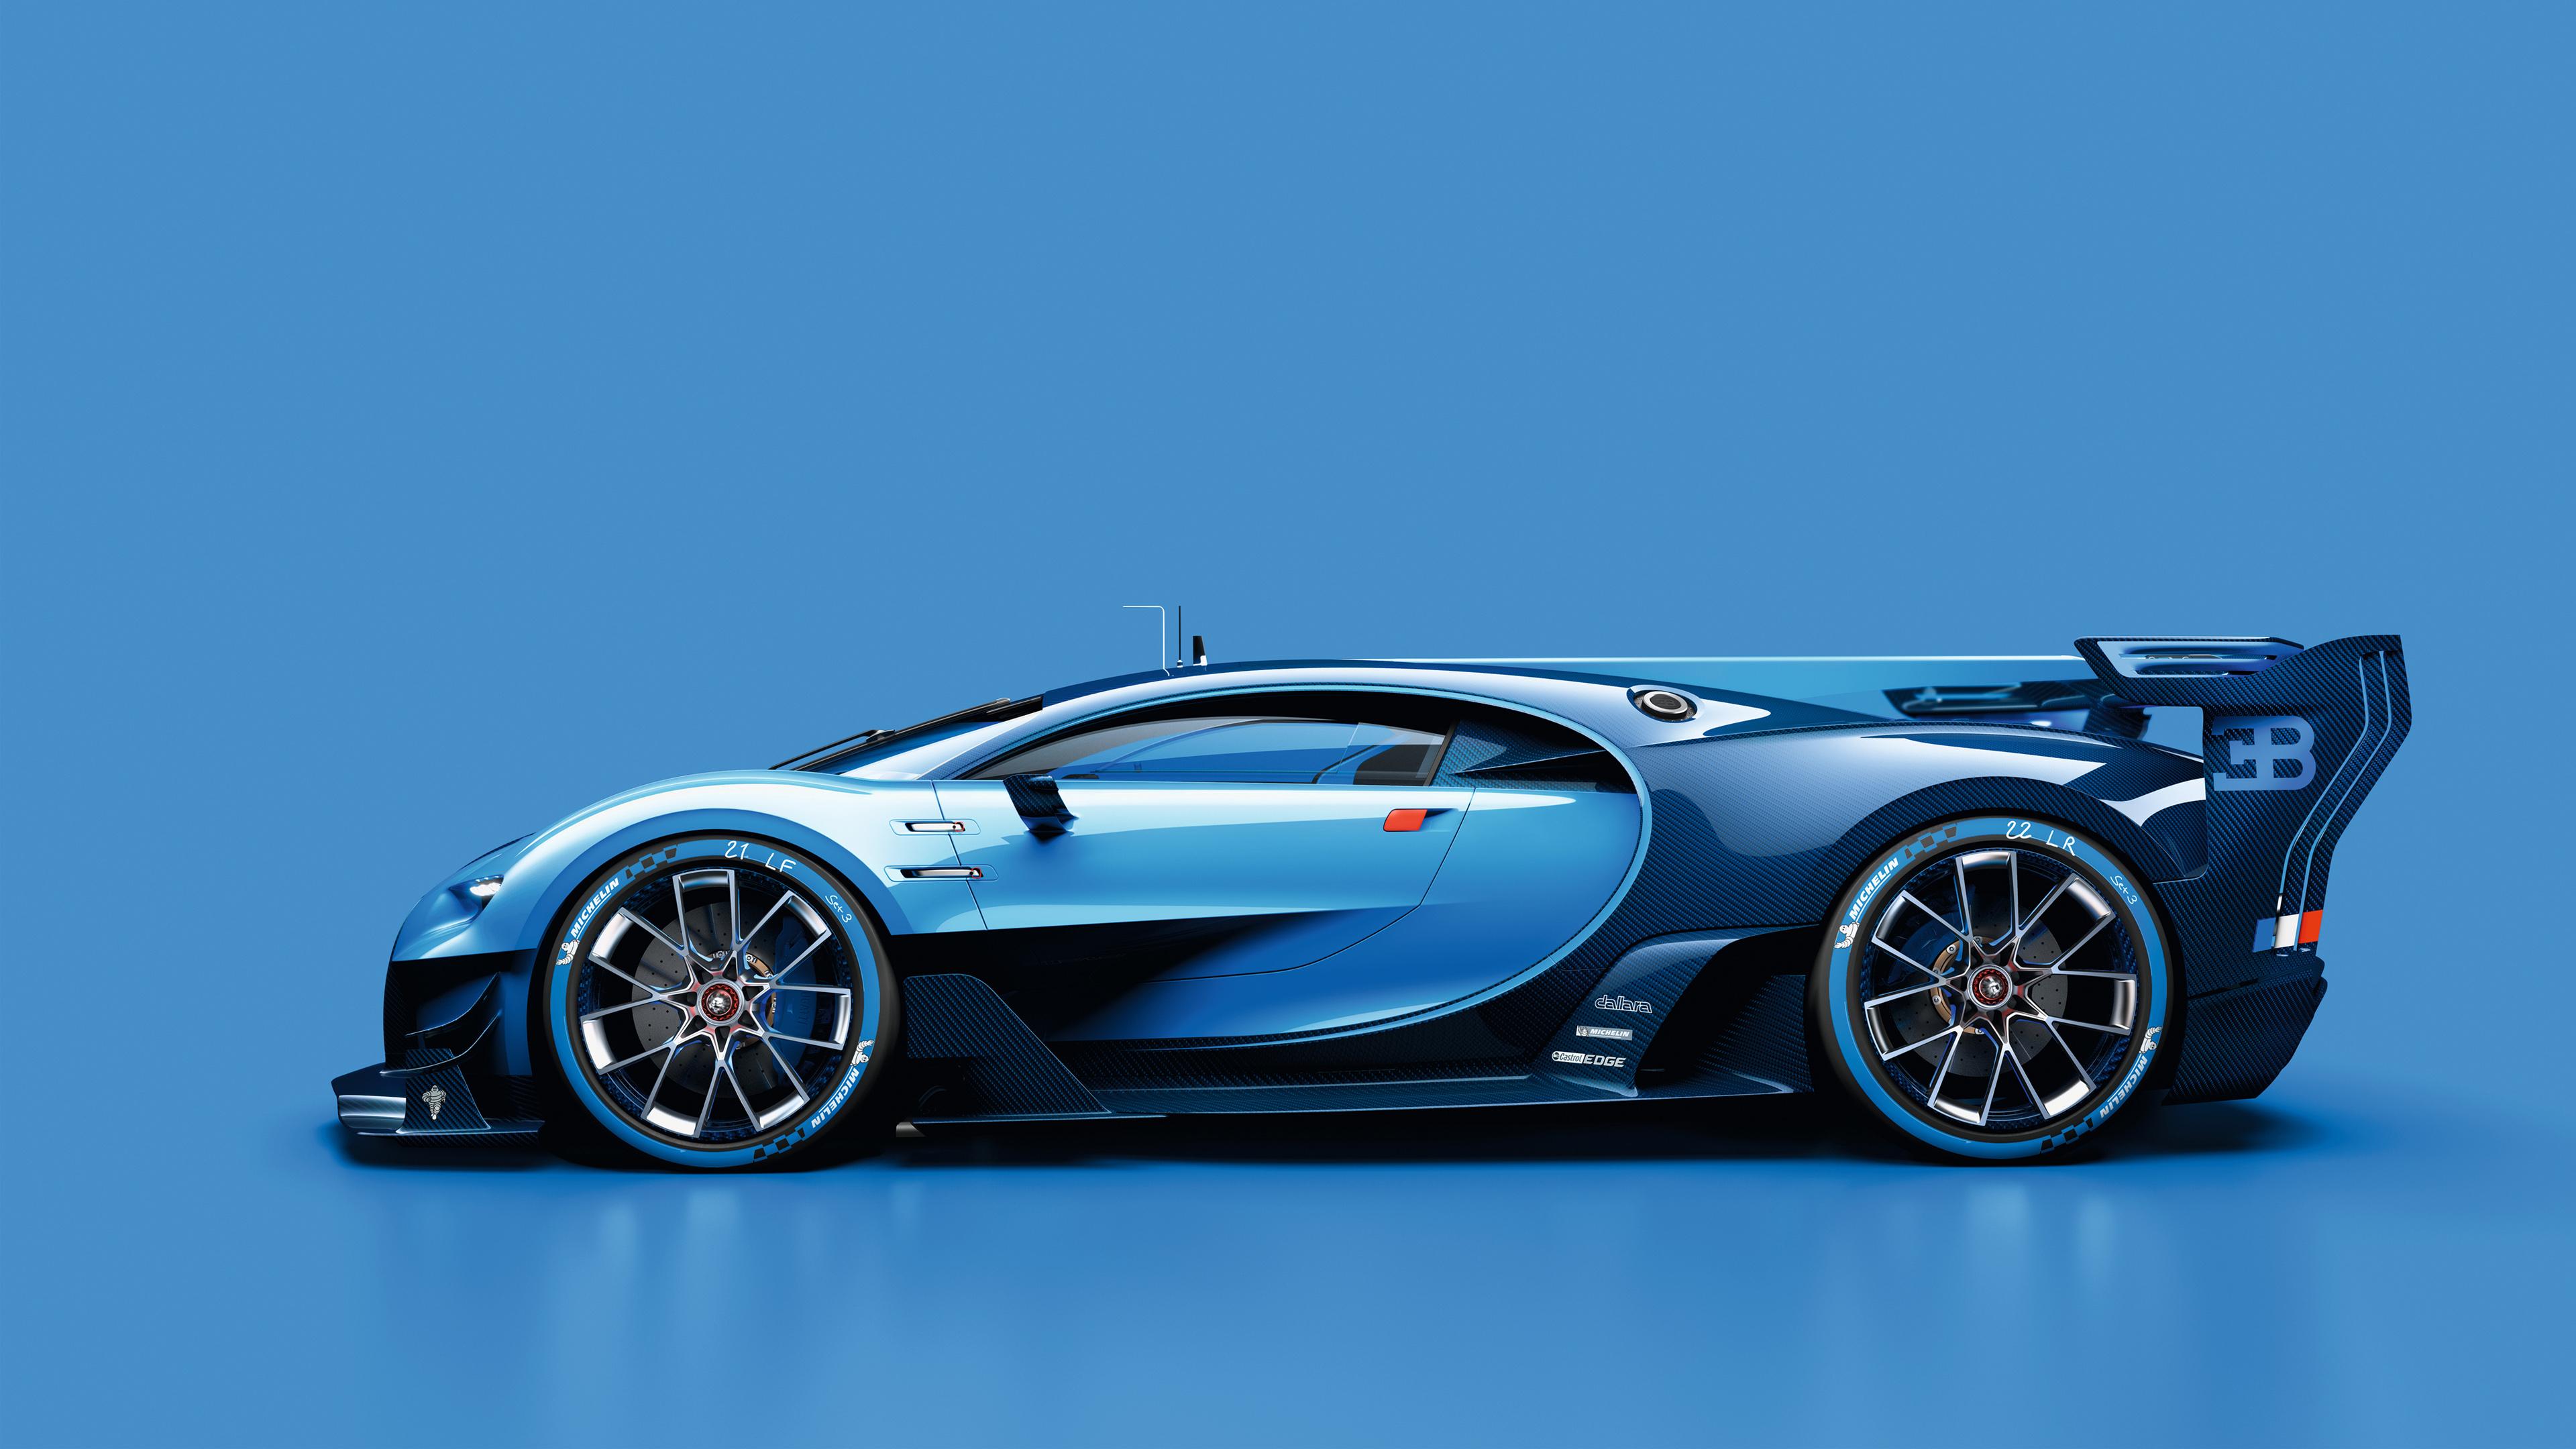 2015 bugatti vision gran turismo 7 wallpaper hd car wallpapers id 5728. Black Bedroom Furniture Sets. Home Design Ideas